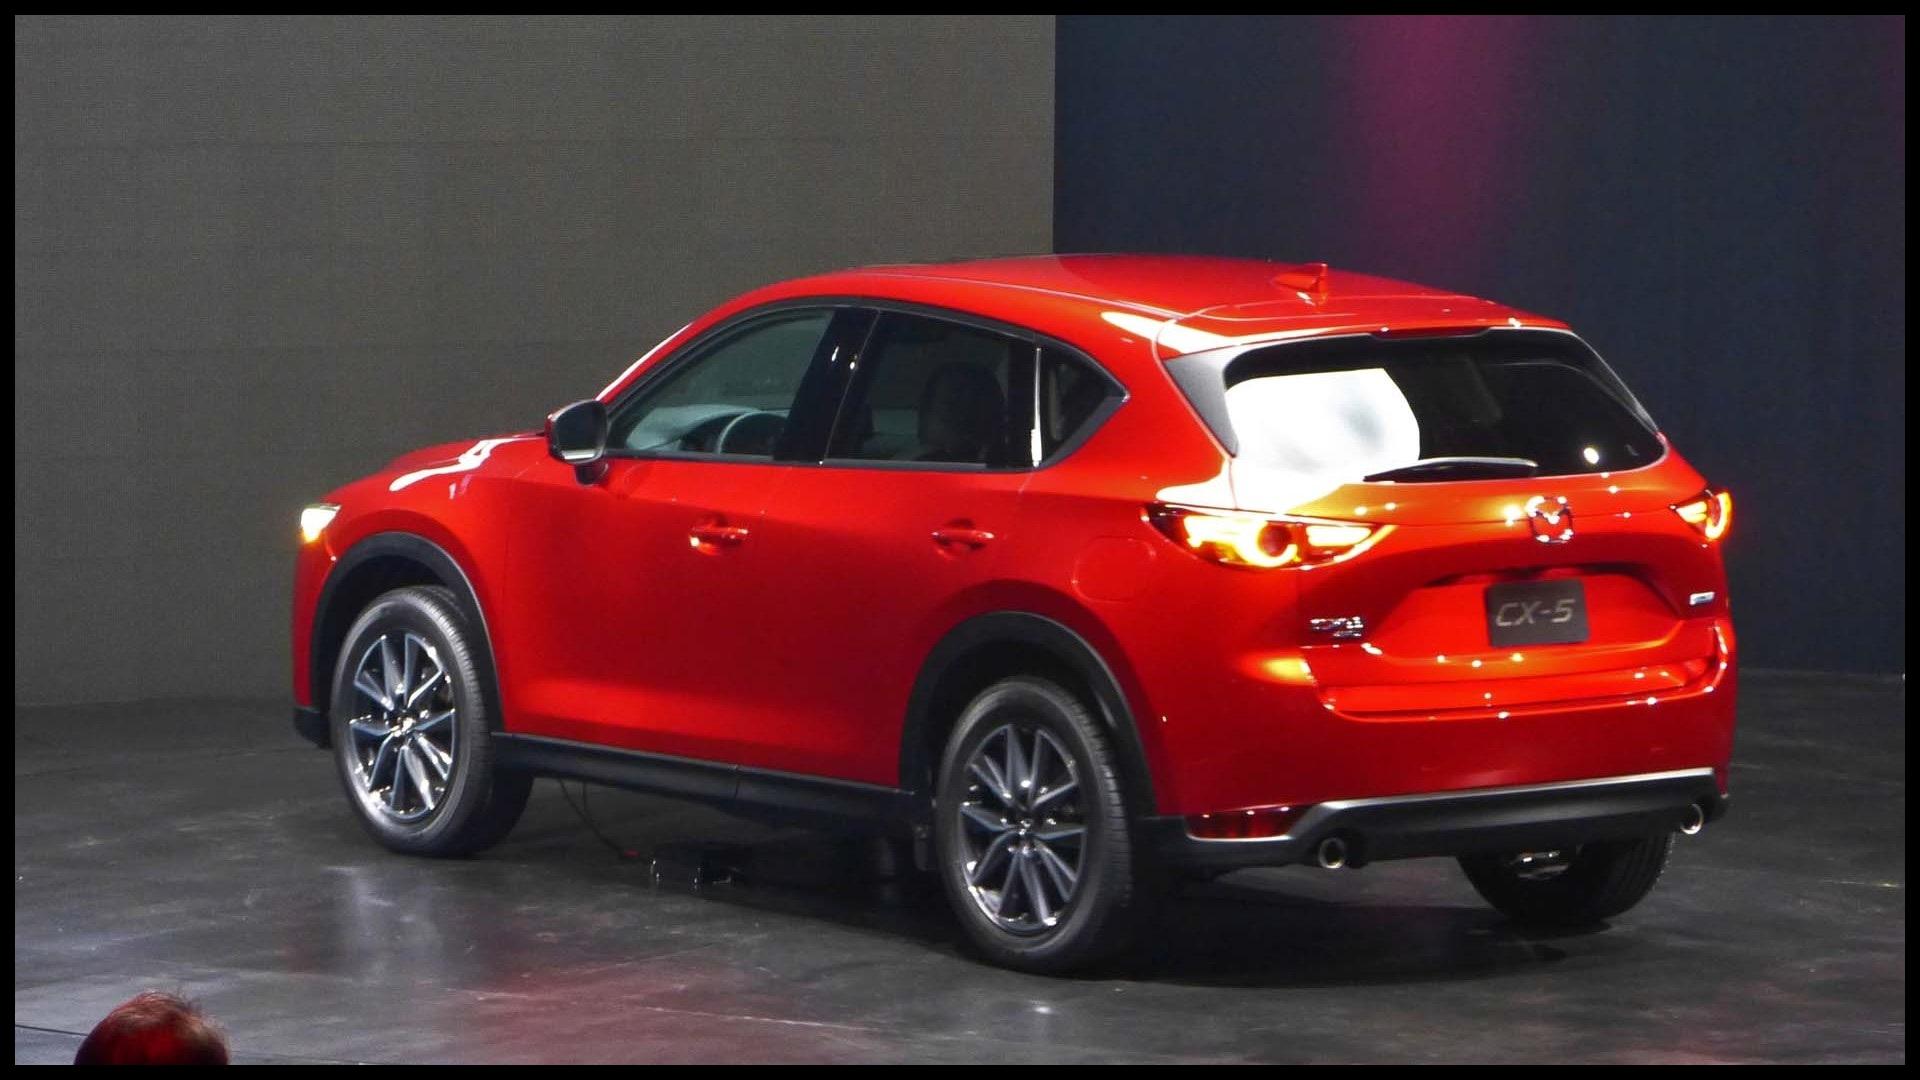 Mazda X5 2018 Review 2017 Mazda Cx 5 Vs 2016 Mazda Cx 5 Review Overview and